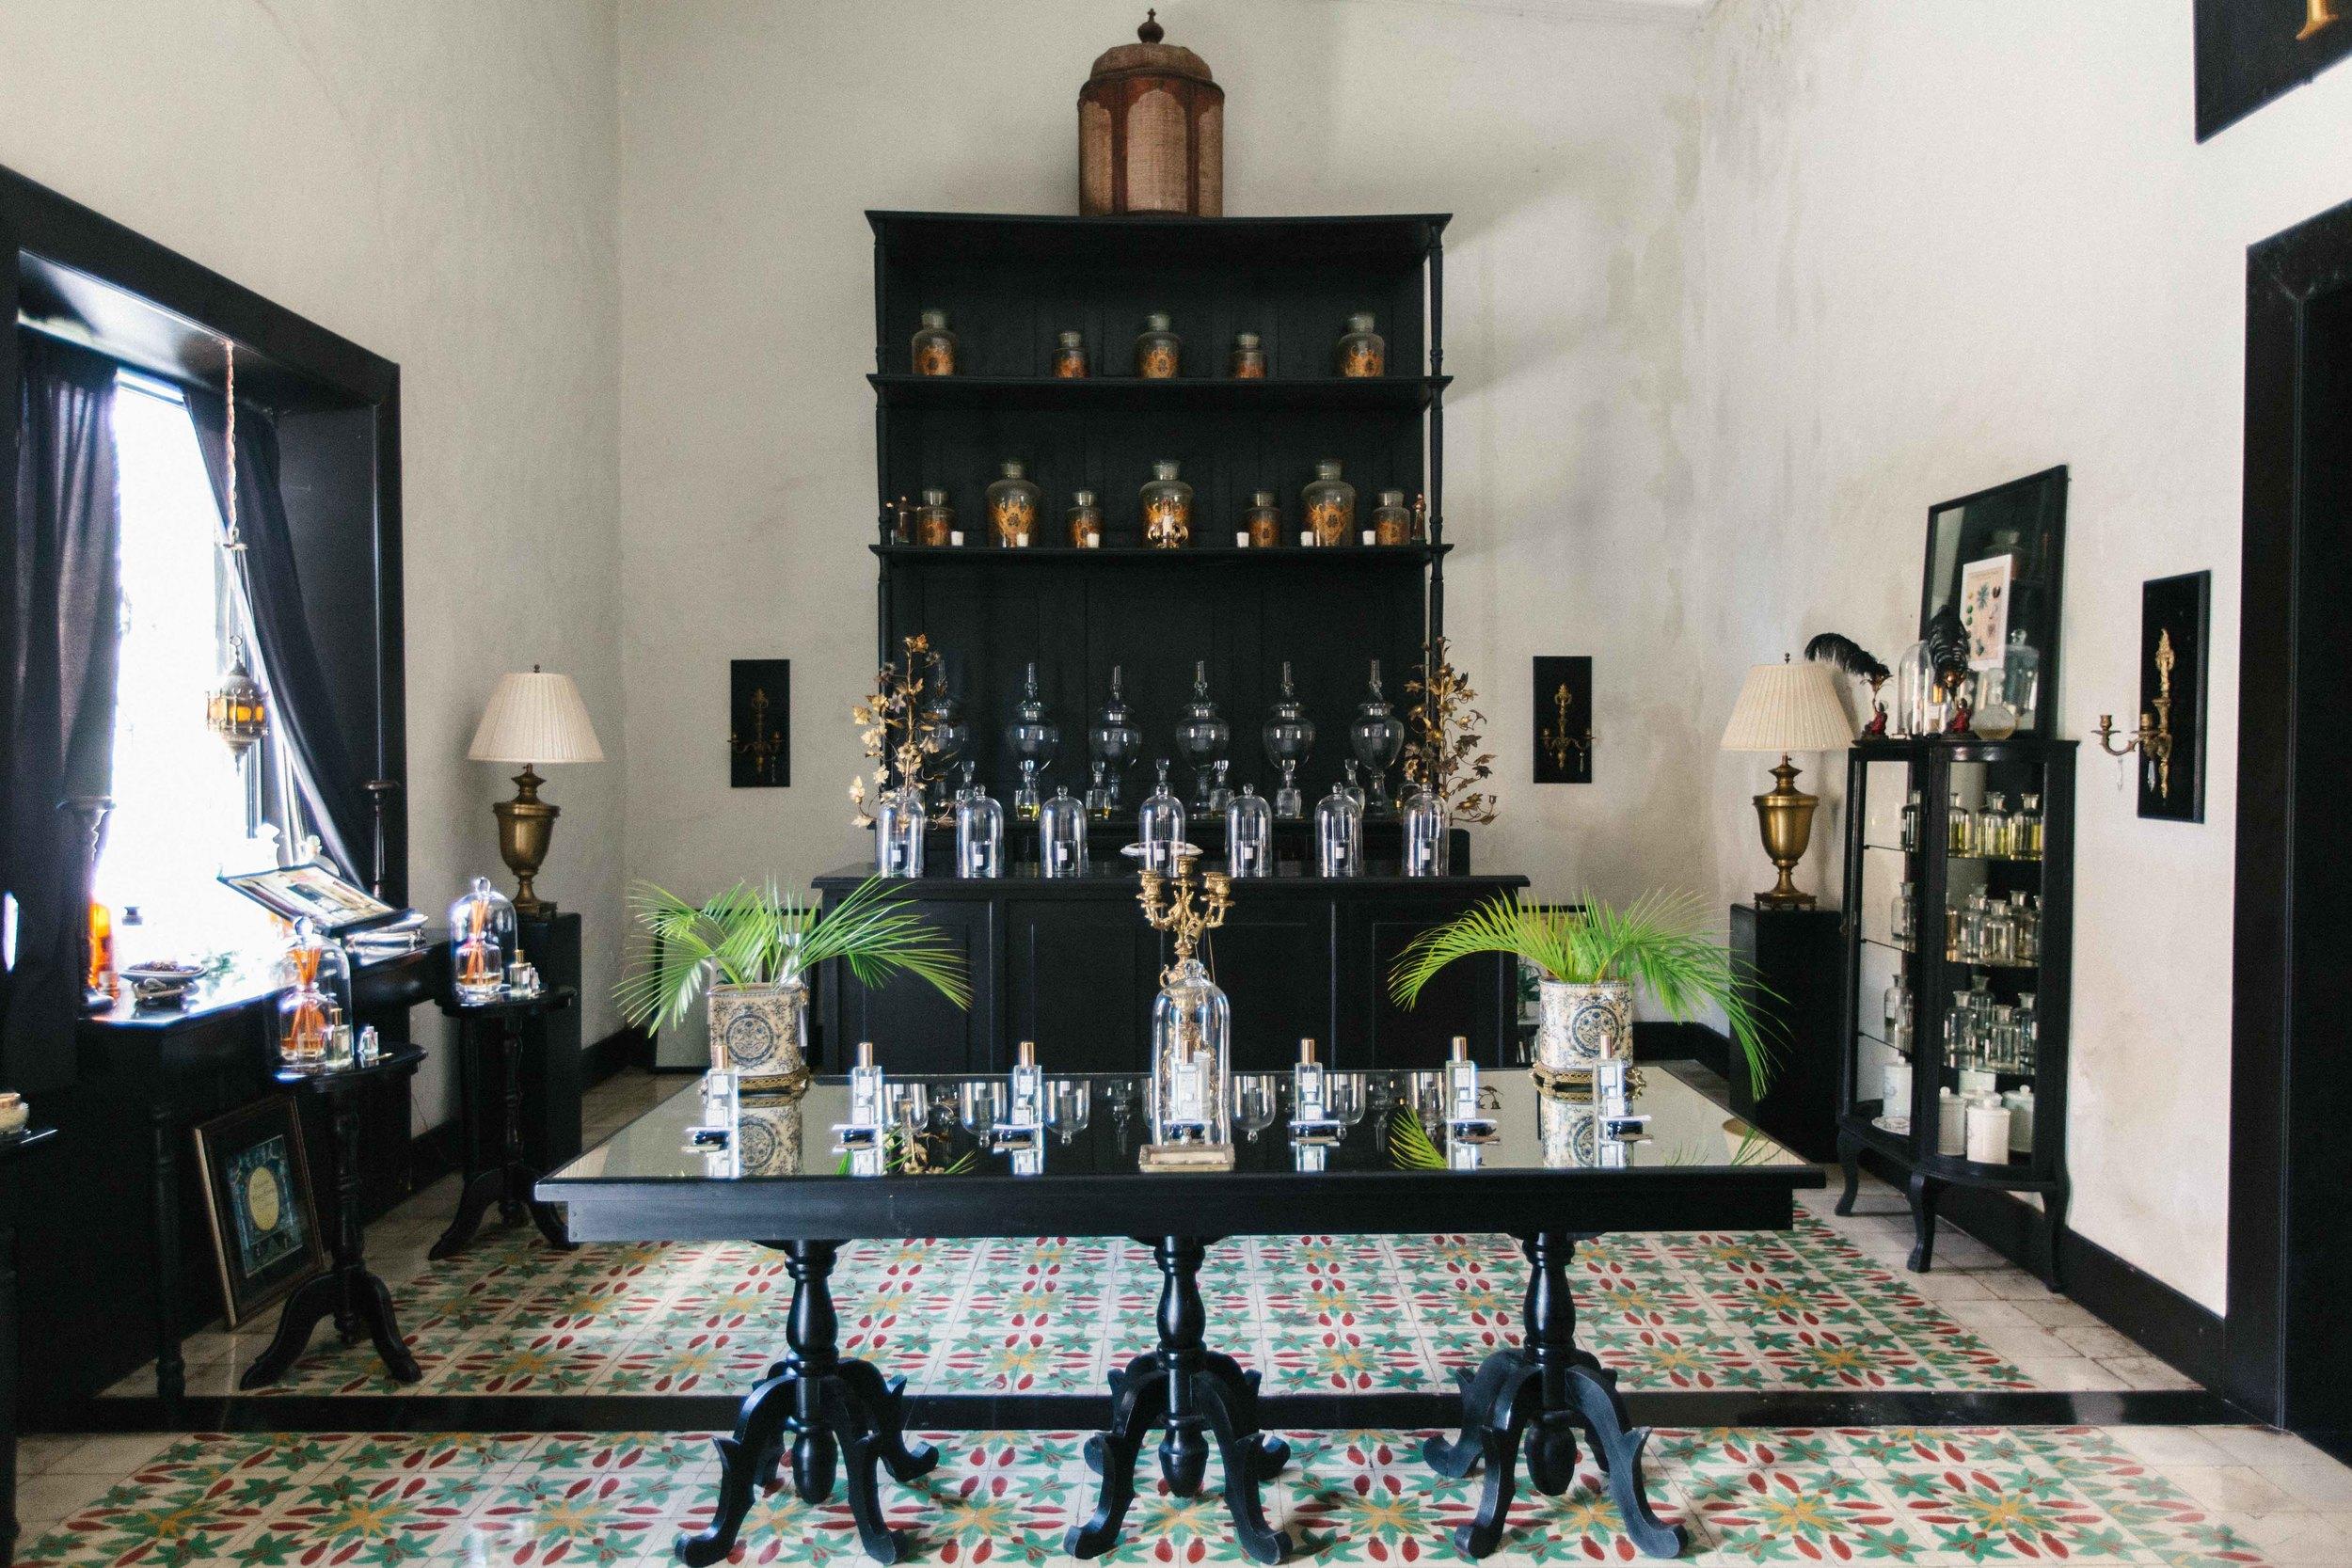 16.TheLine_CC_Valladolid_Perfumeria-2 copia.JPG